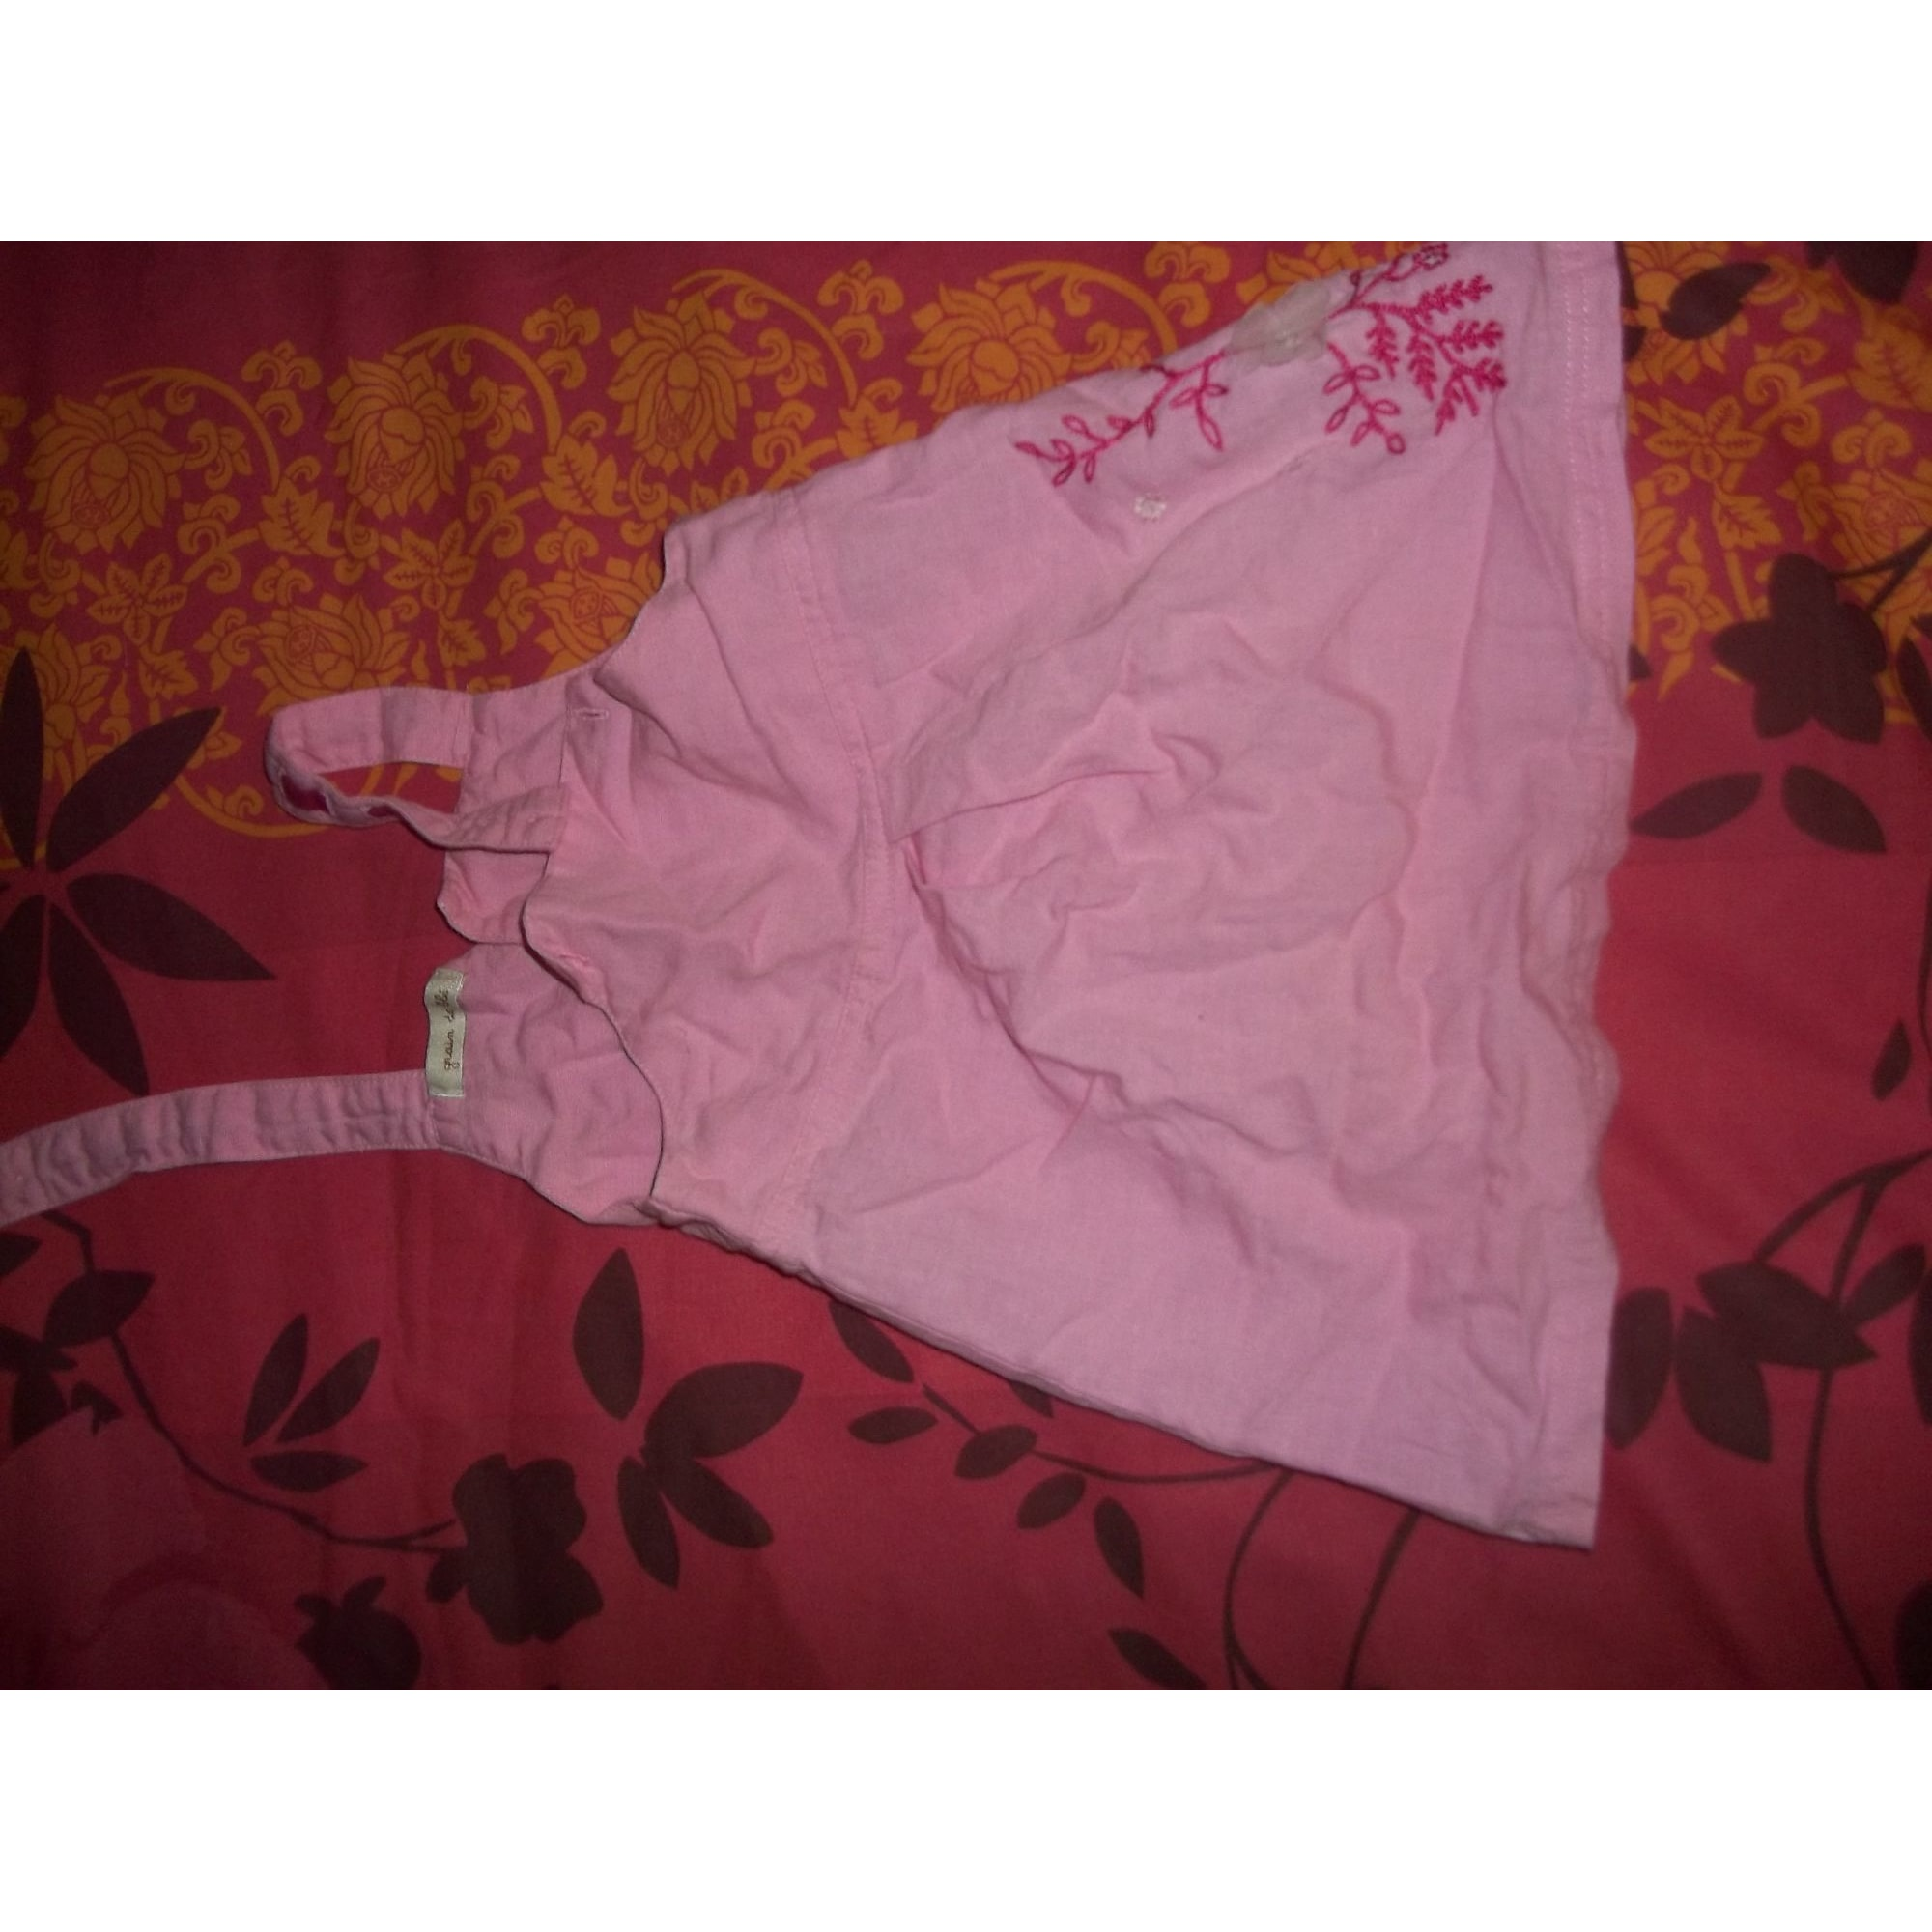 Robe GRAIN DE BLÉ Rose, fuschia, vieux rose